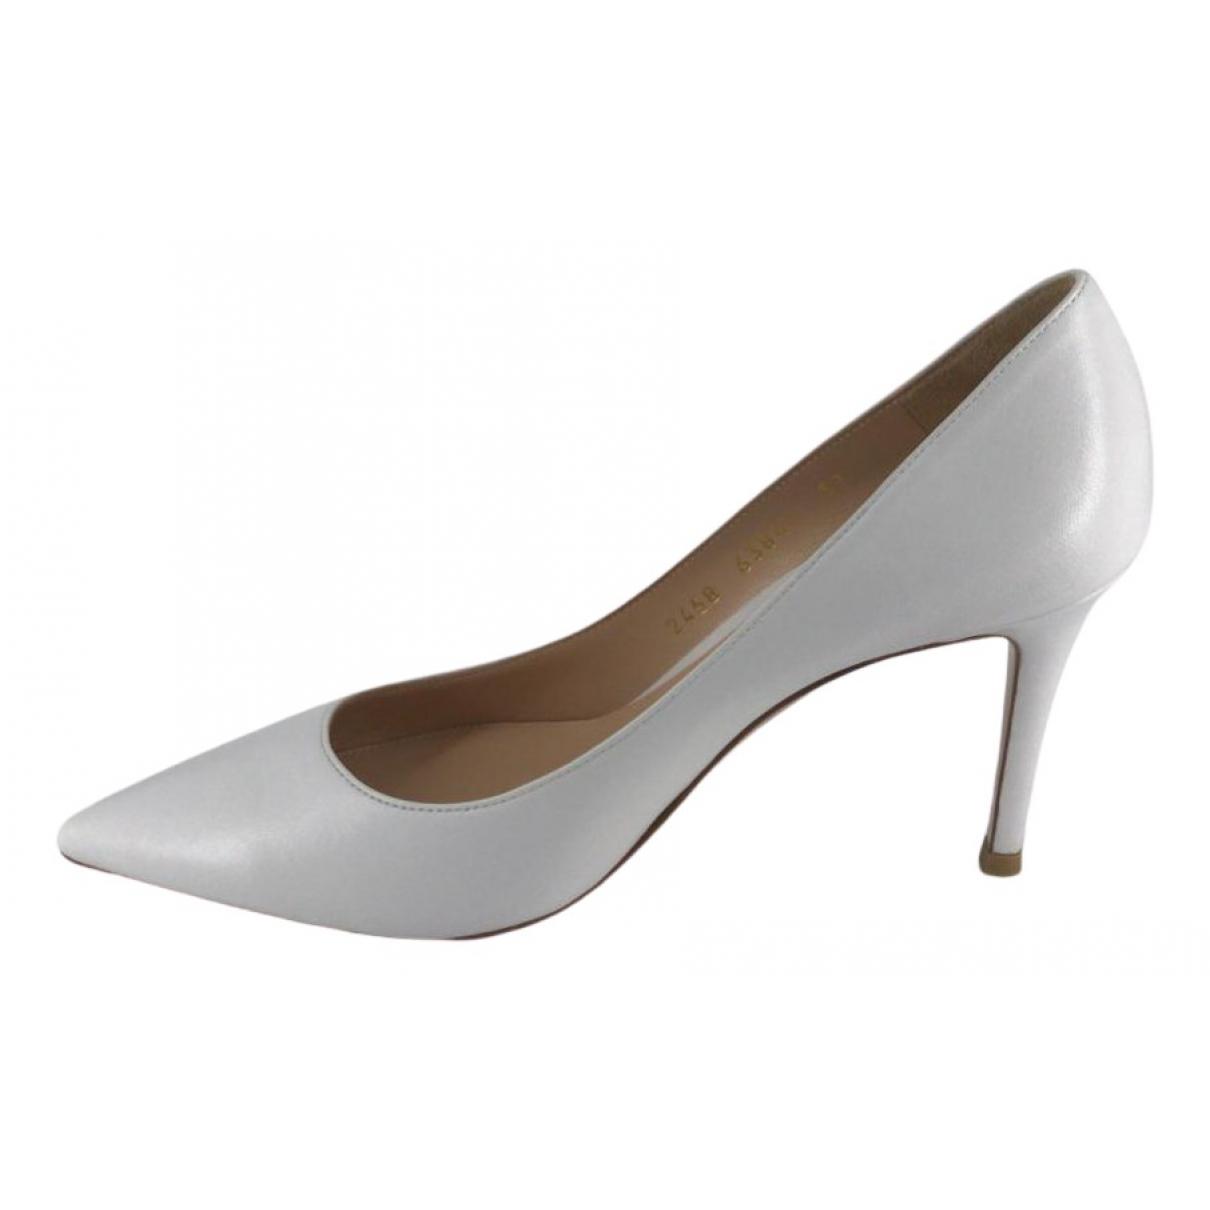 Gianvito Rossi - Escarpins   pour femme en cuir - blanc